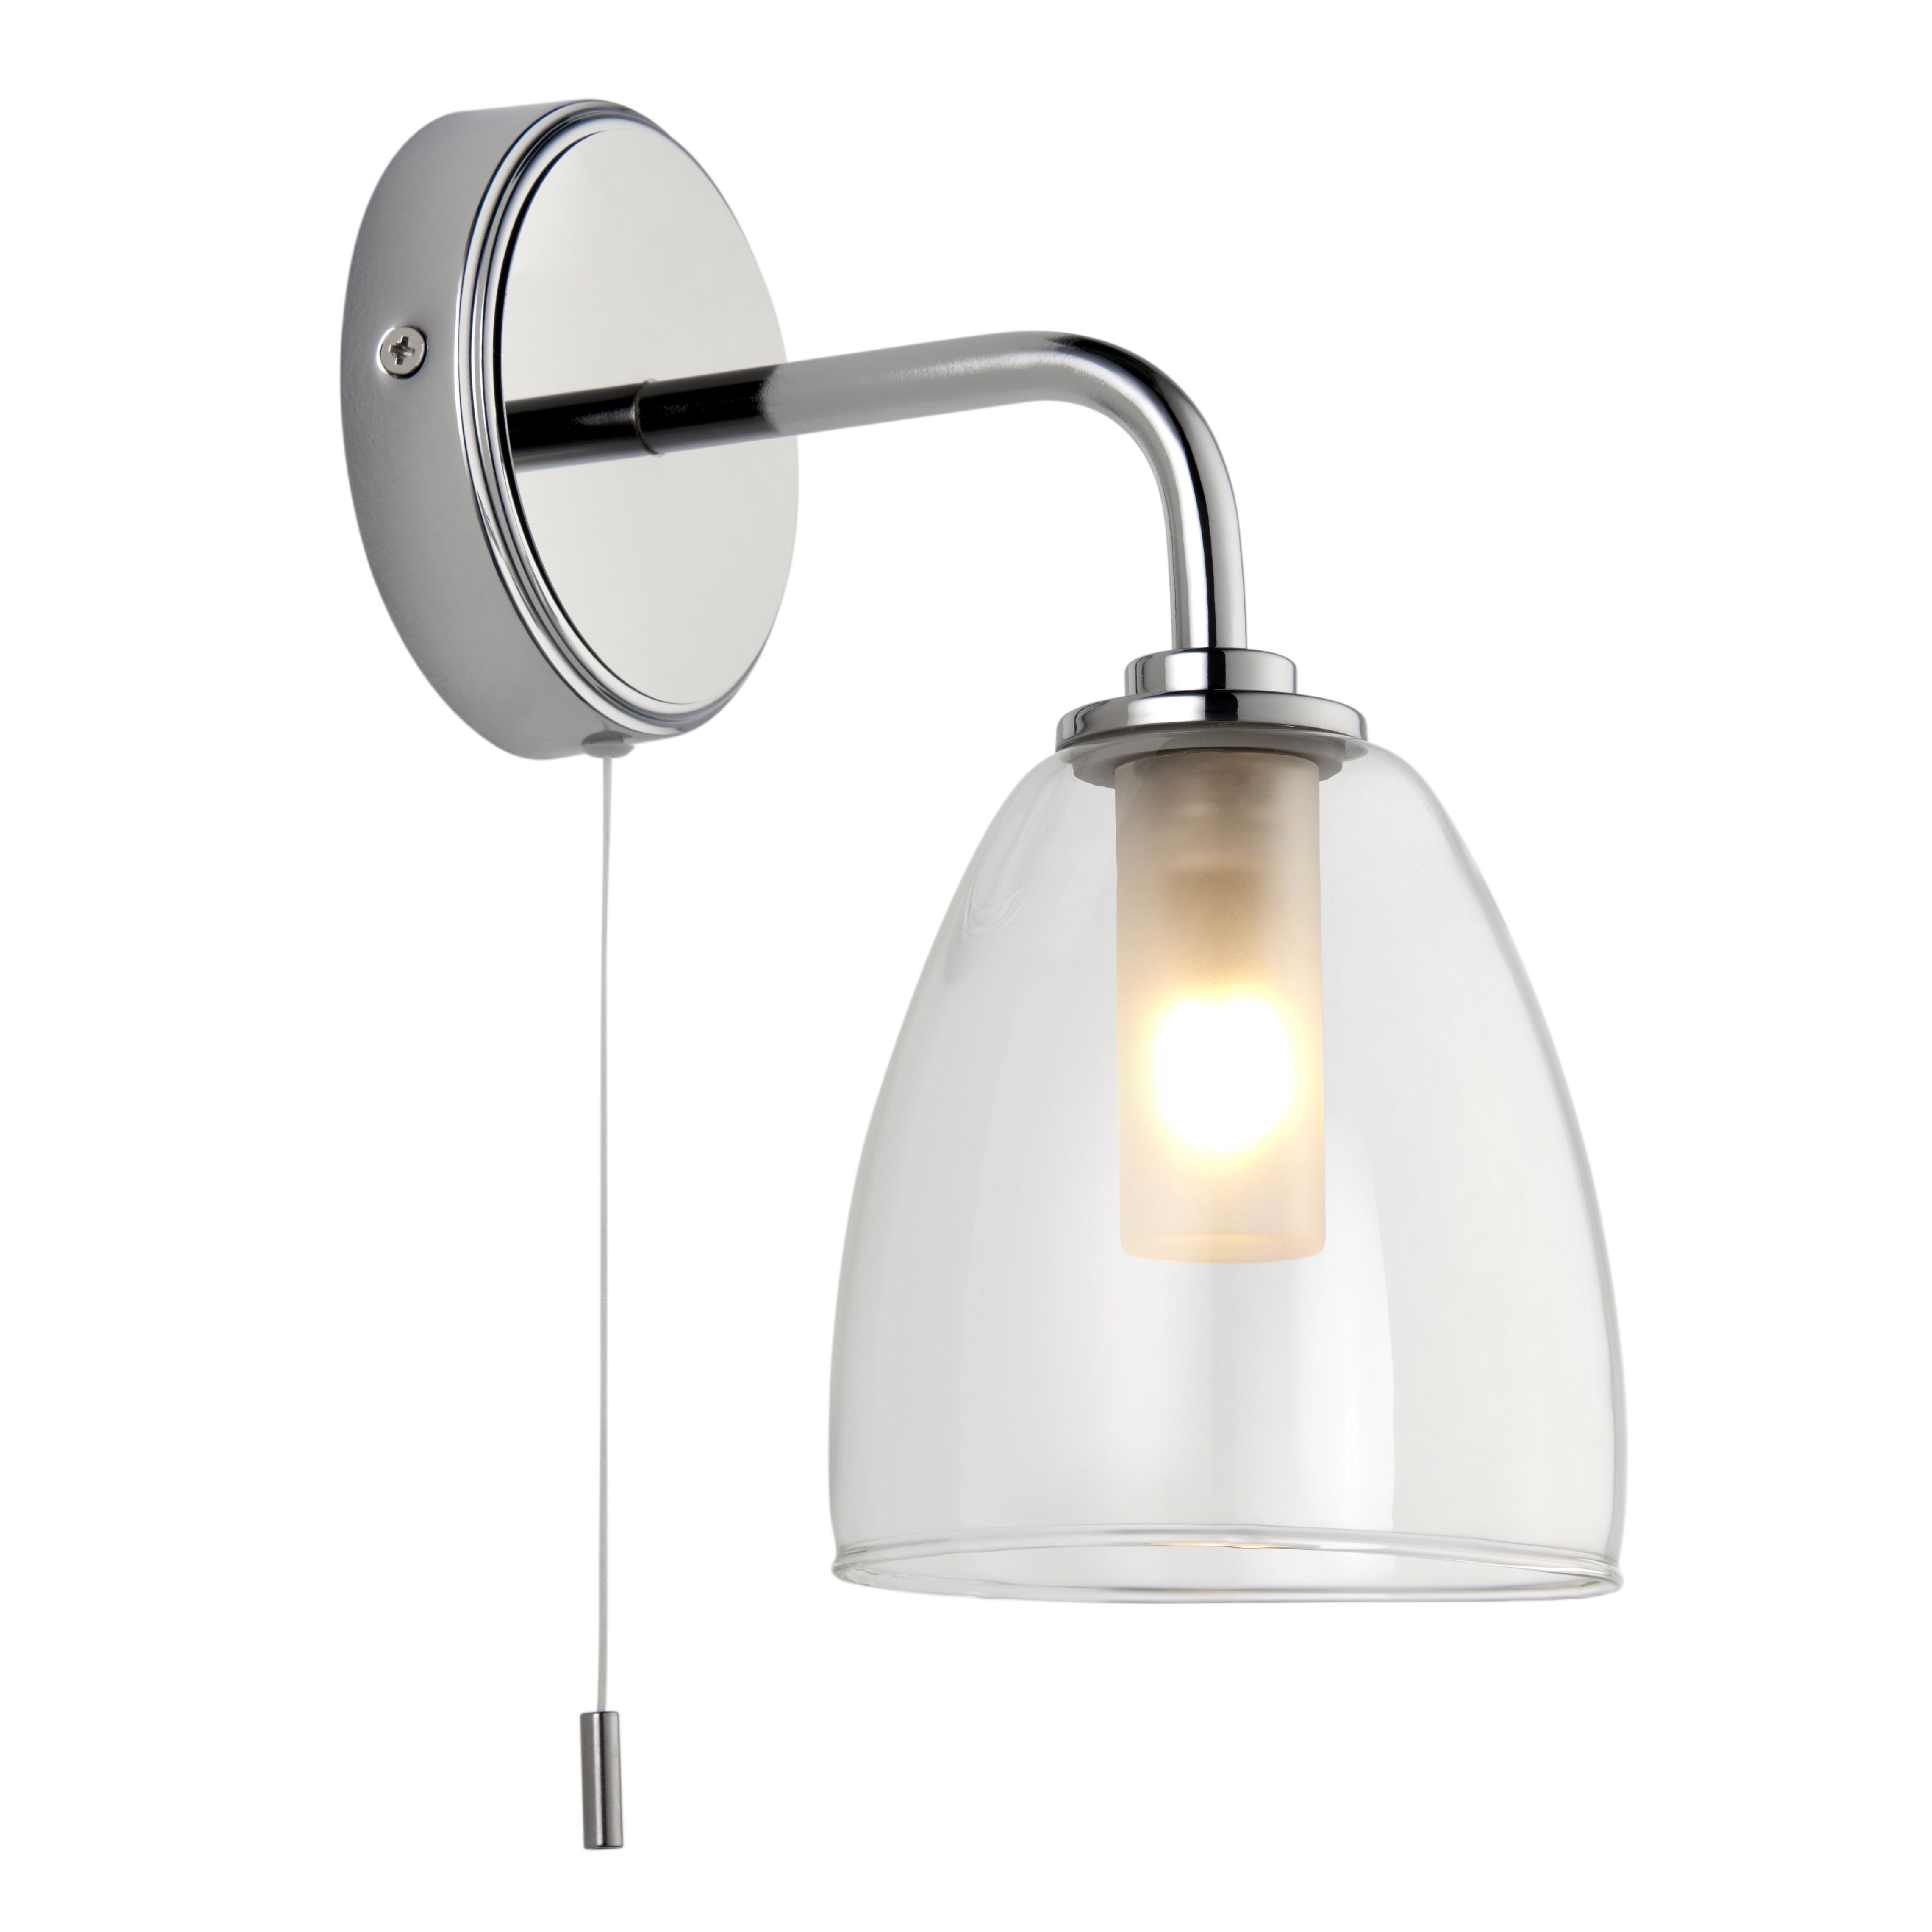 Elias Polished Chrome Effect Bathroom Wall Light Departments Diy At B Q